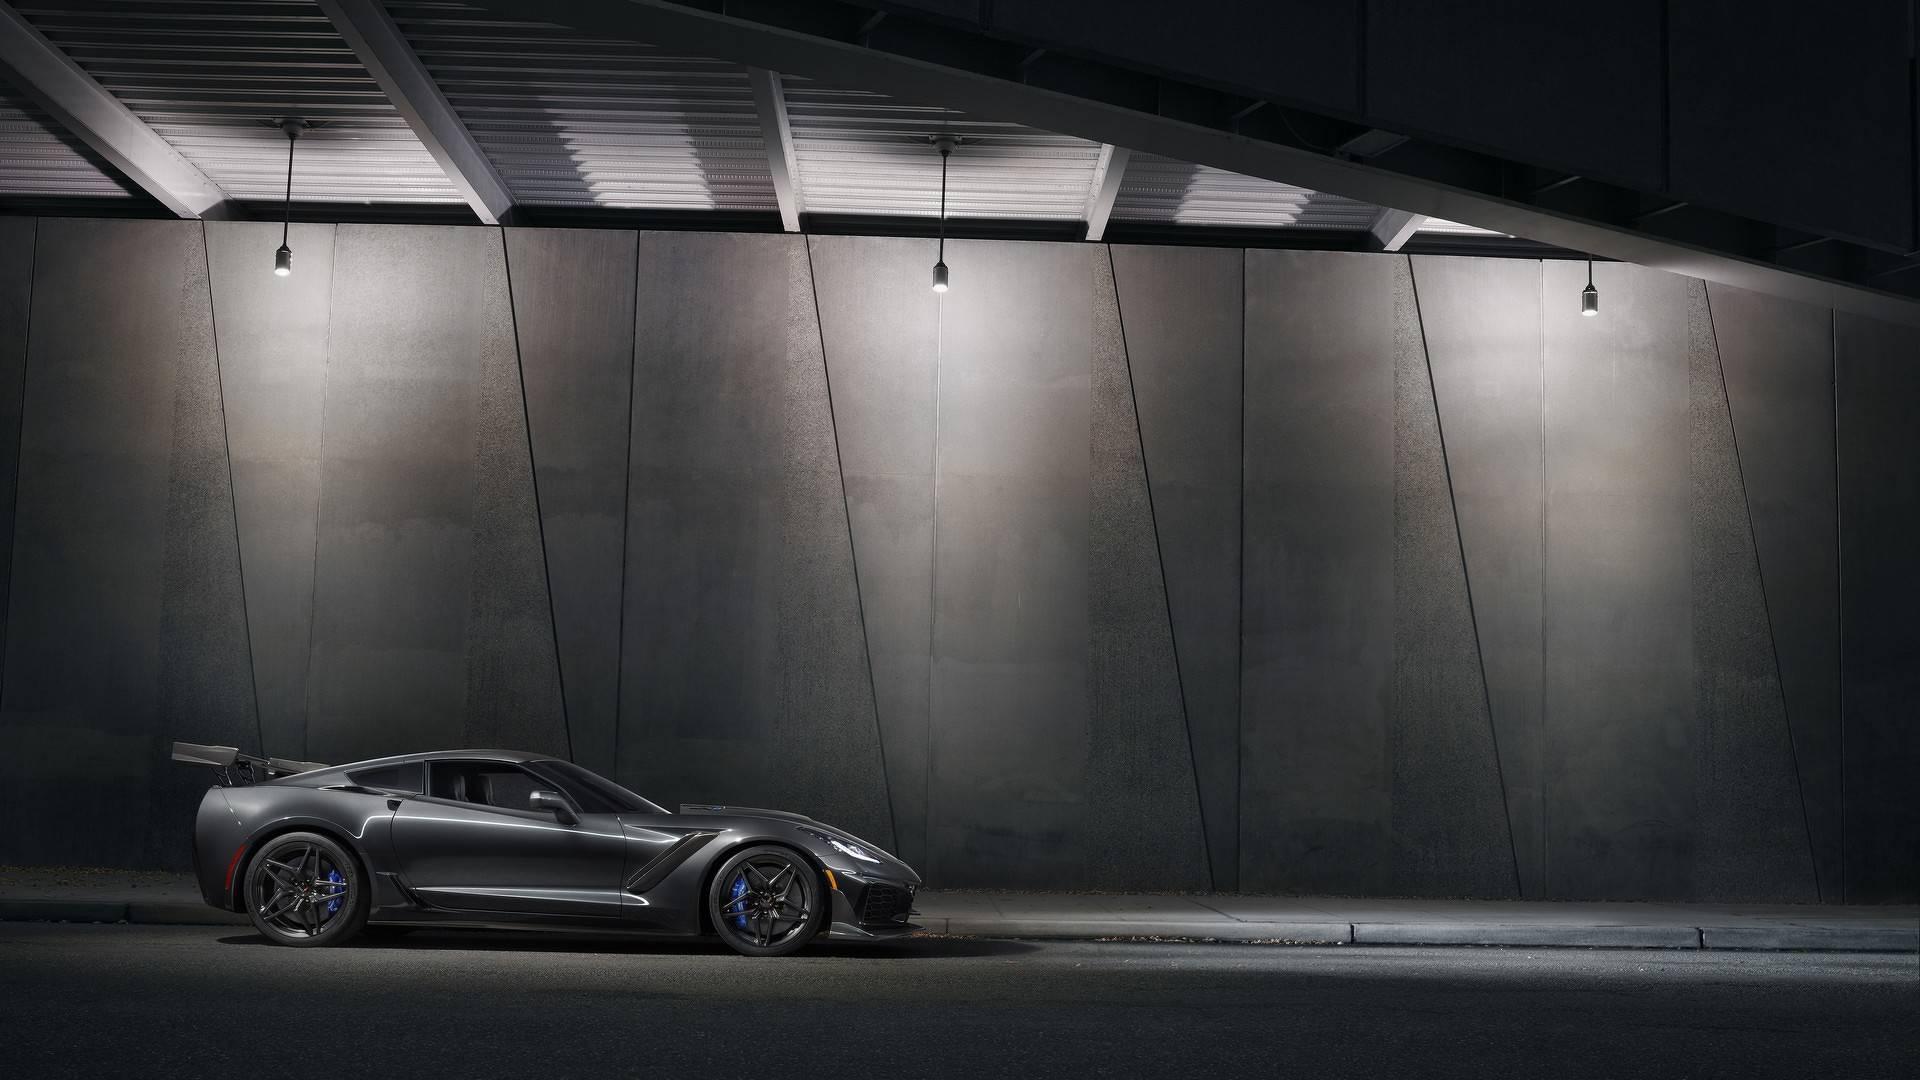 2019 chevy corvette zr1 شورولت کوروت ZR1 مدل ۲۰۱۹ رونمای شد   اجاره ماشین